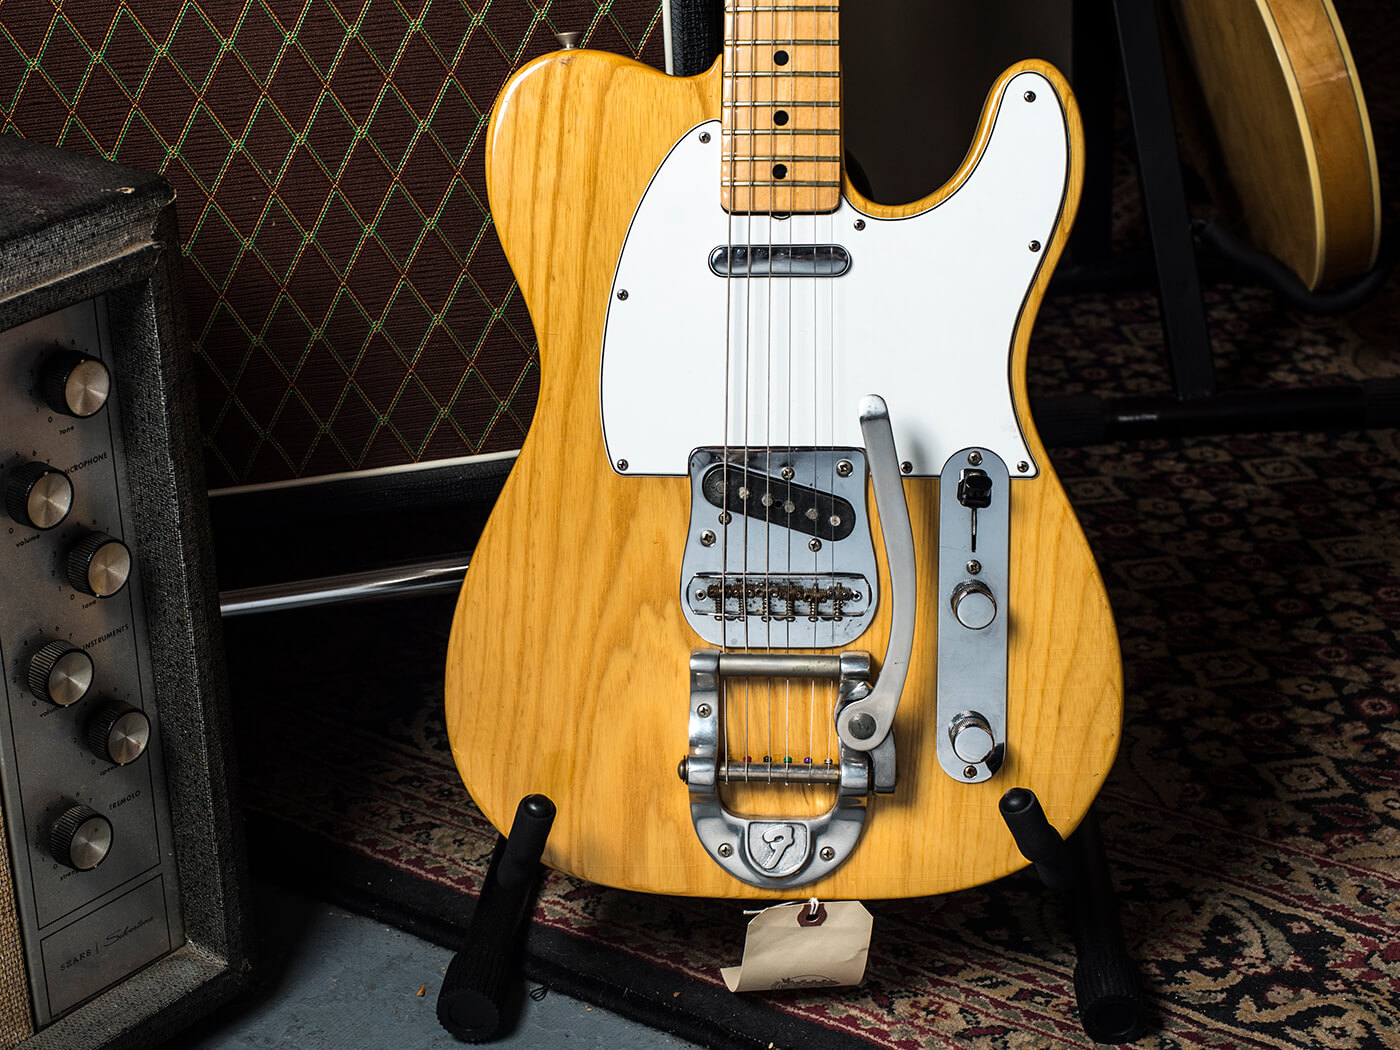 Imperial Vintage '74 Fender Telecaster with original 'F' Bigsby